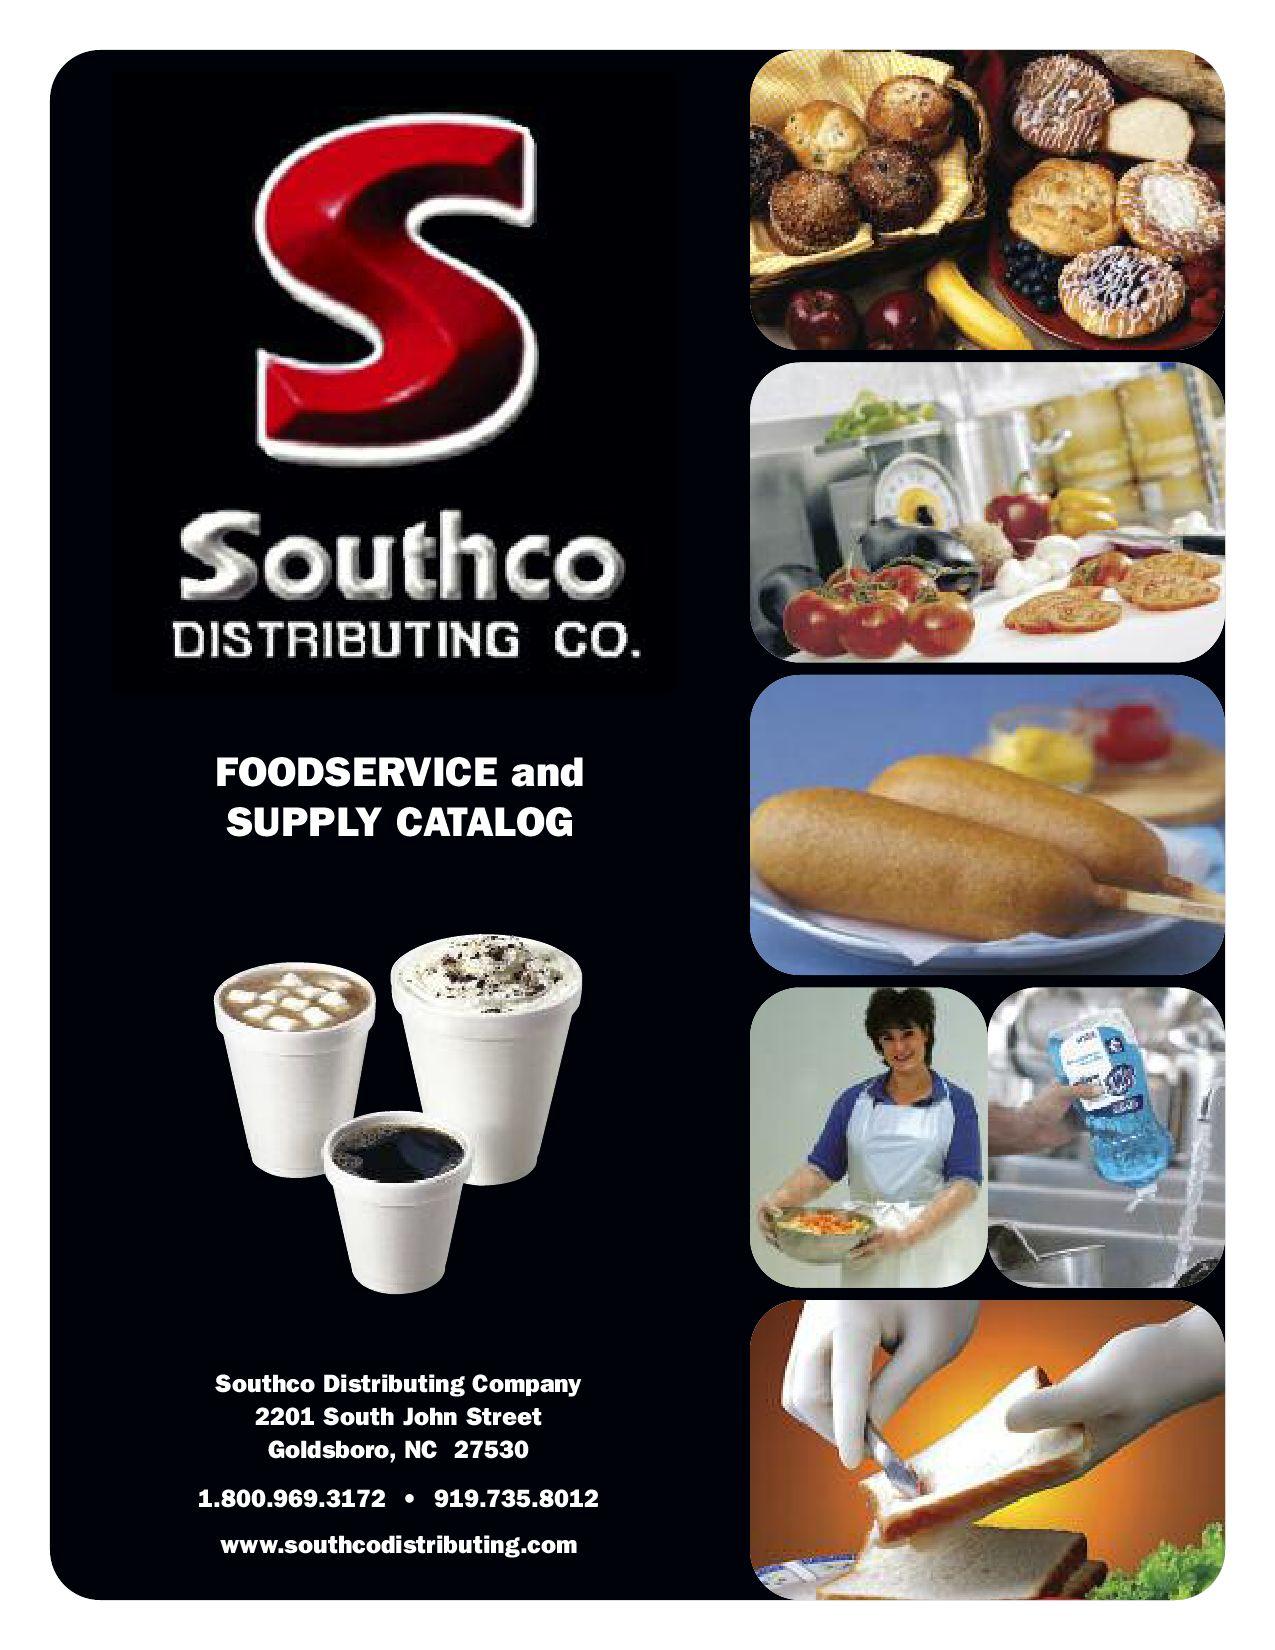 Southco Food Service Catalog by Southco Distributing Company - issuu